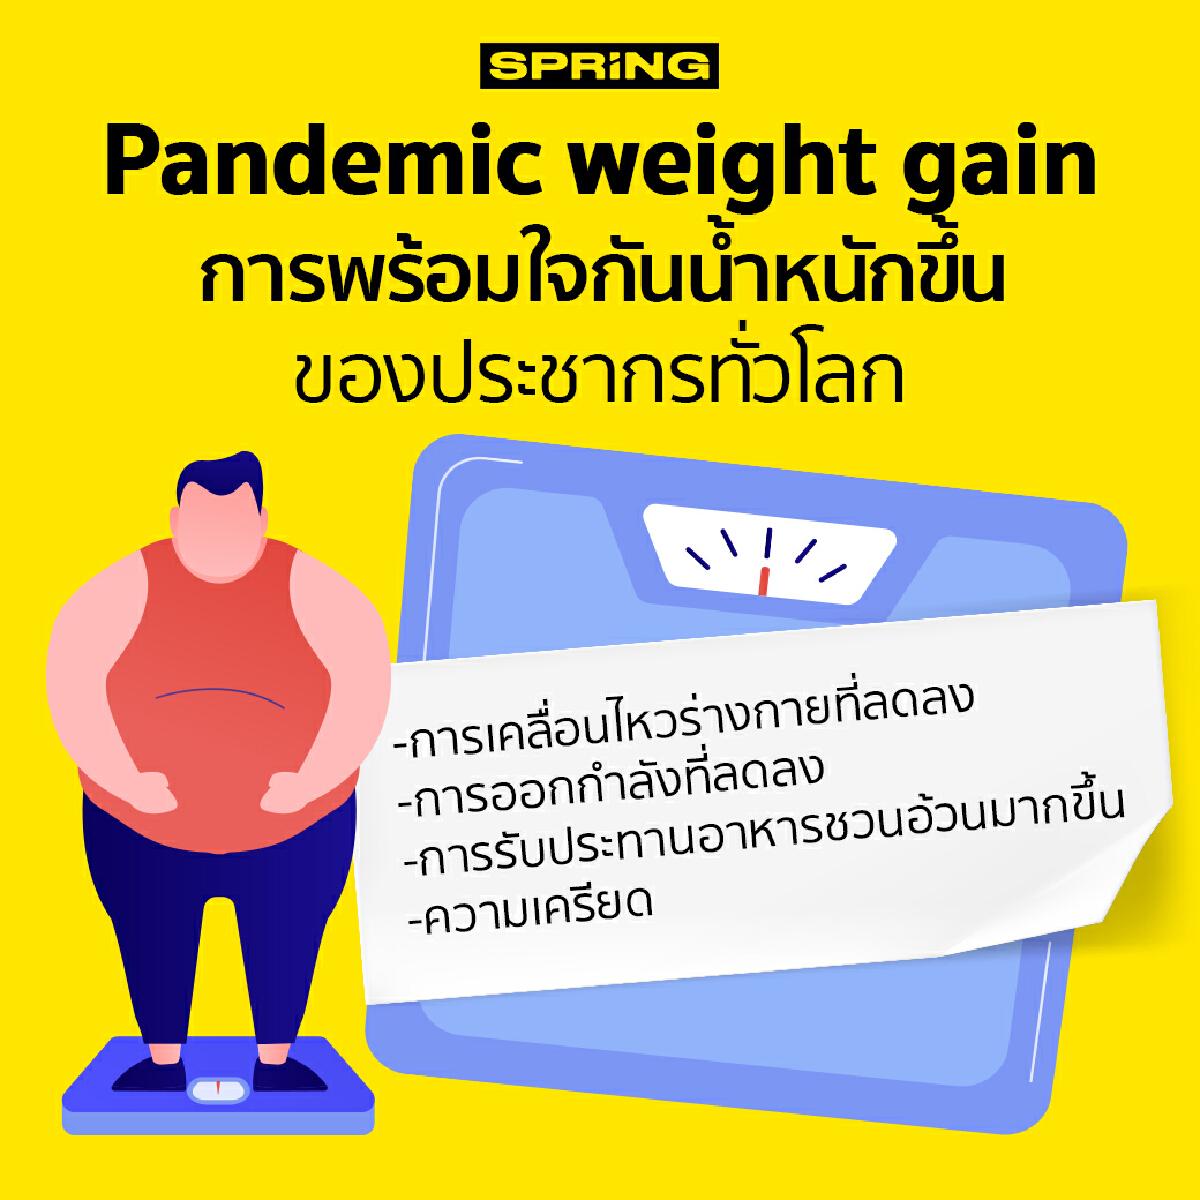 Pandemic weight gain ผลกระทบจากโควิด-19